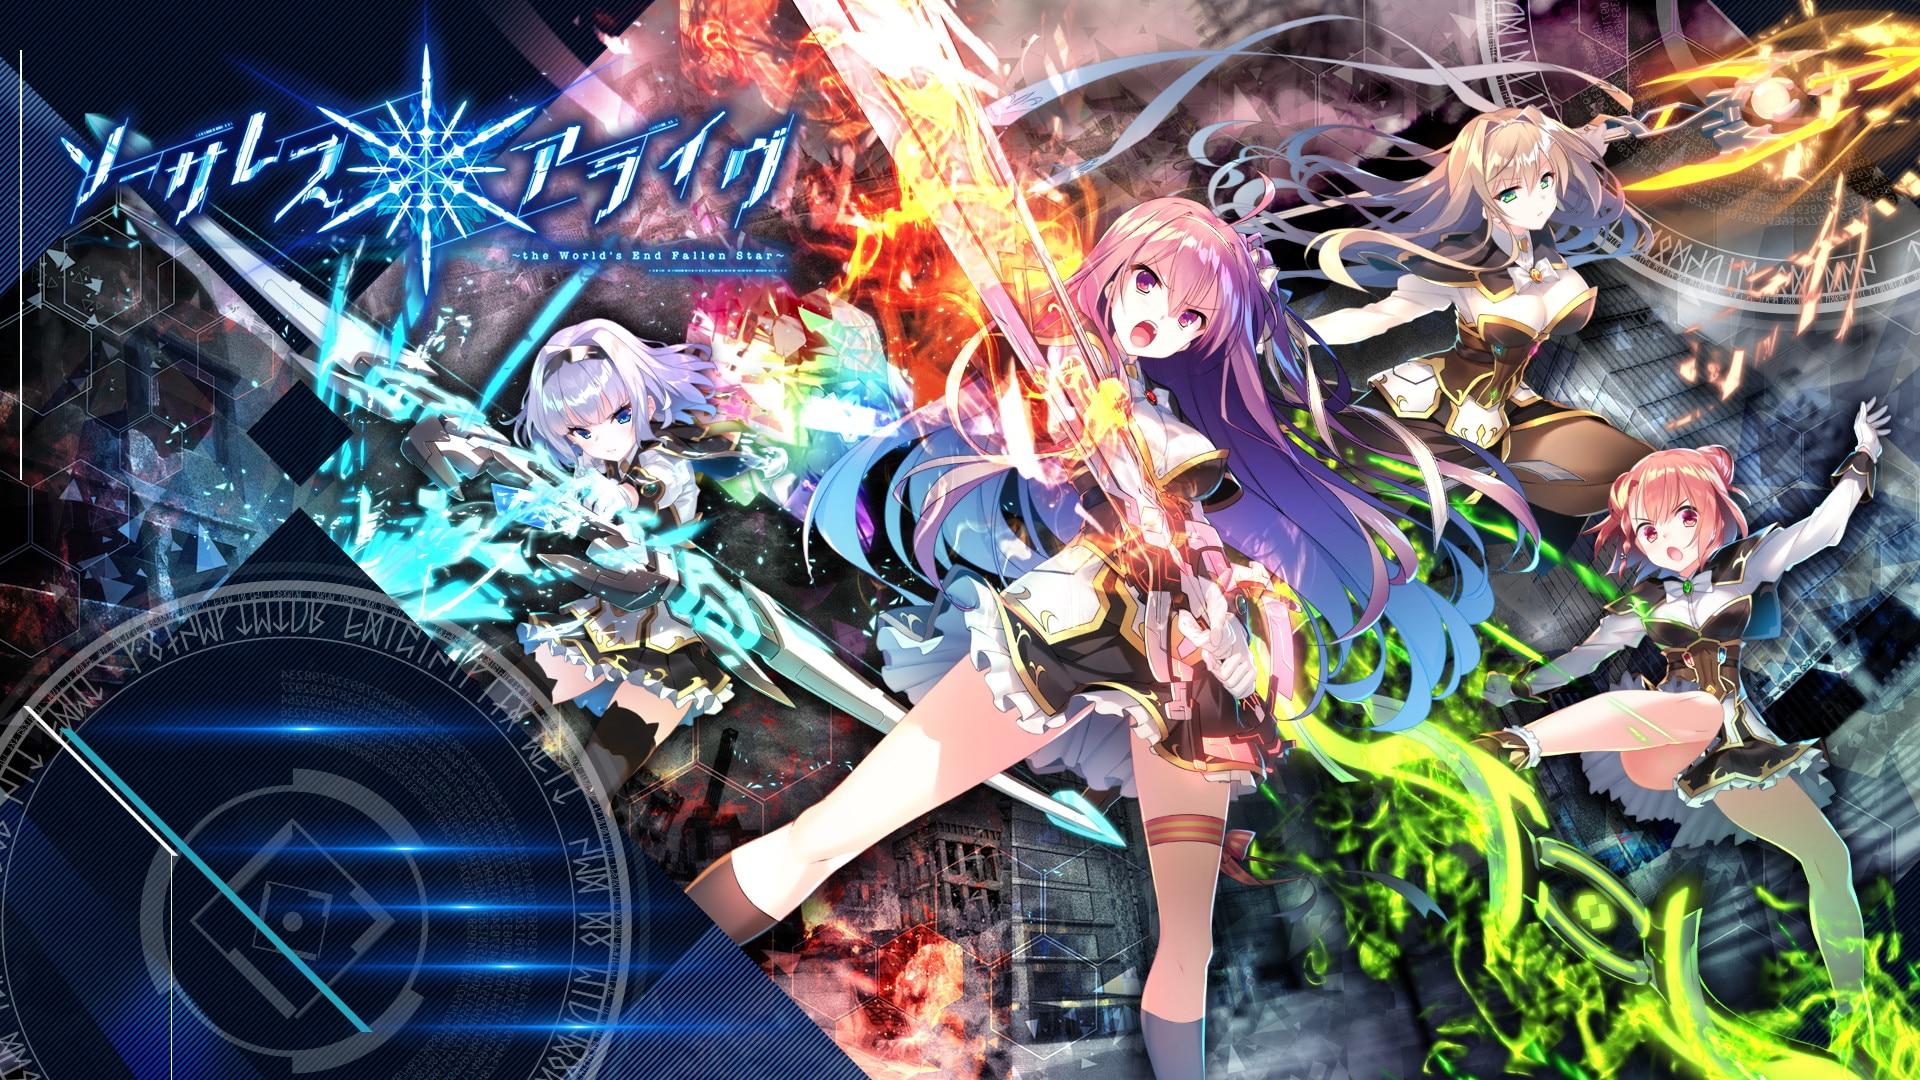 [Fluorite] ソーサレス*アライヴ!~the World's End Fallen Star~ 游戏本体+游...